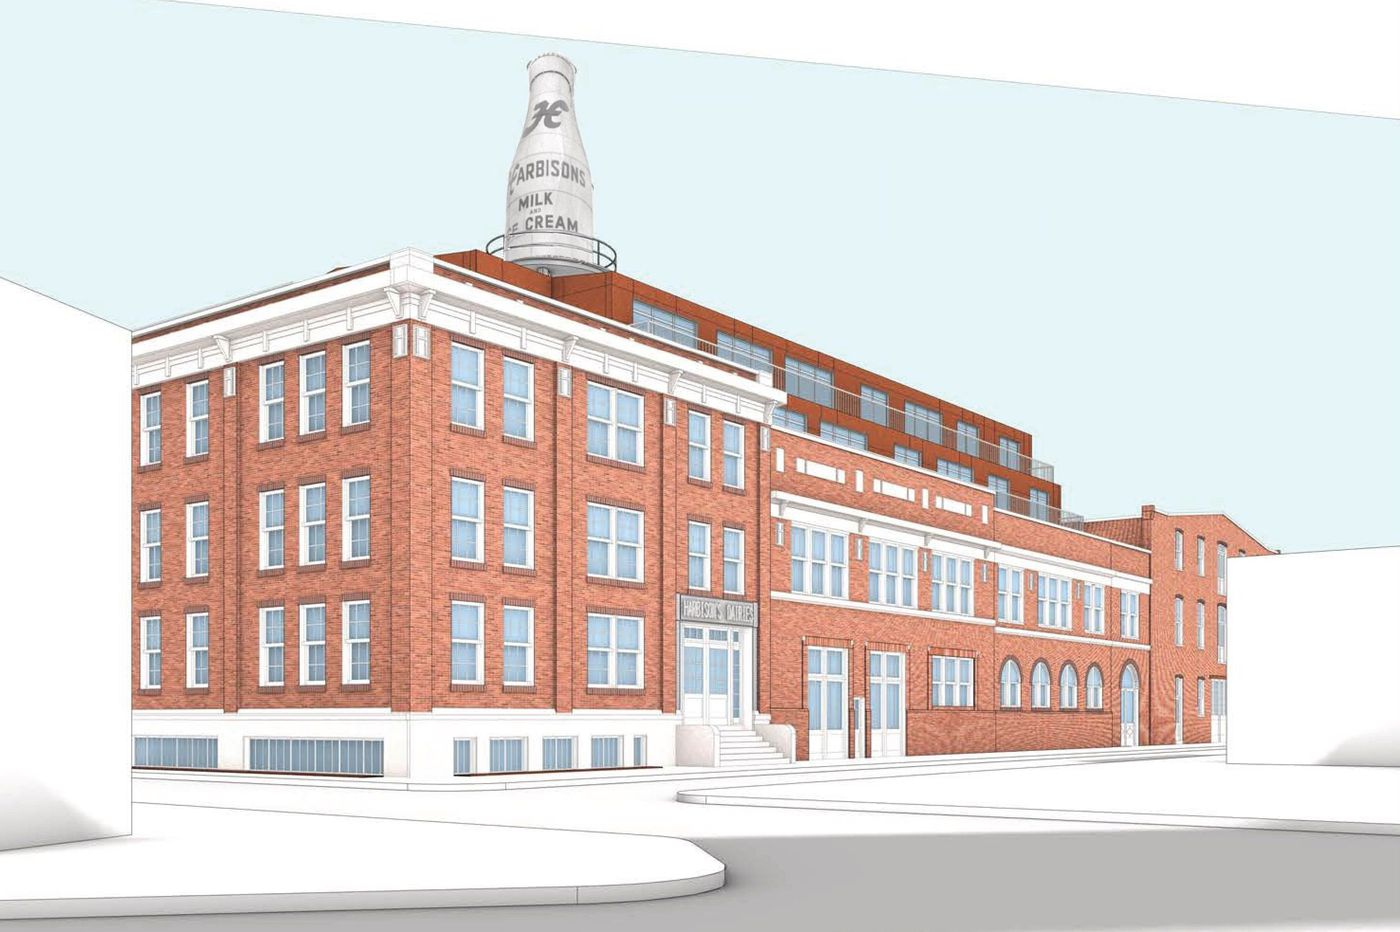 Plan to convert Kensington dairy plant to apartments keeps landmark 'milk bottle' in place